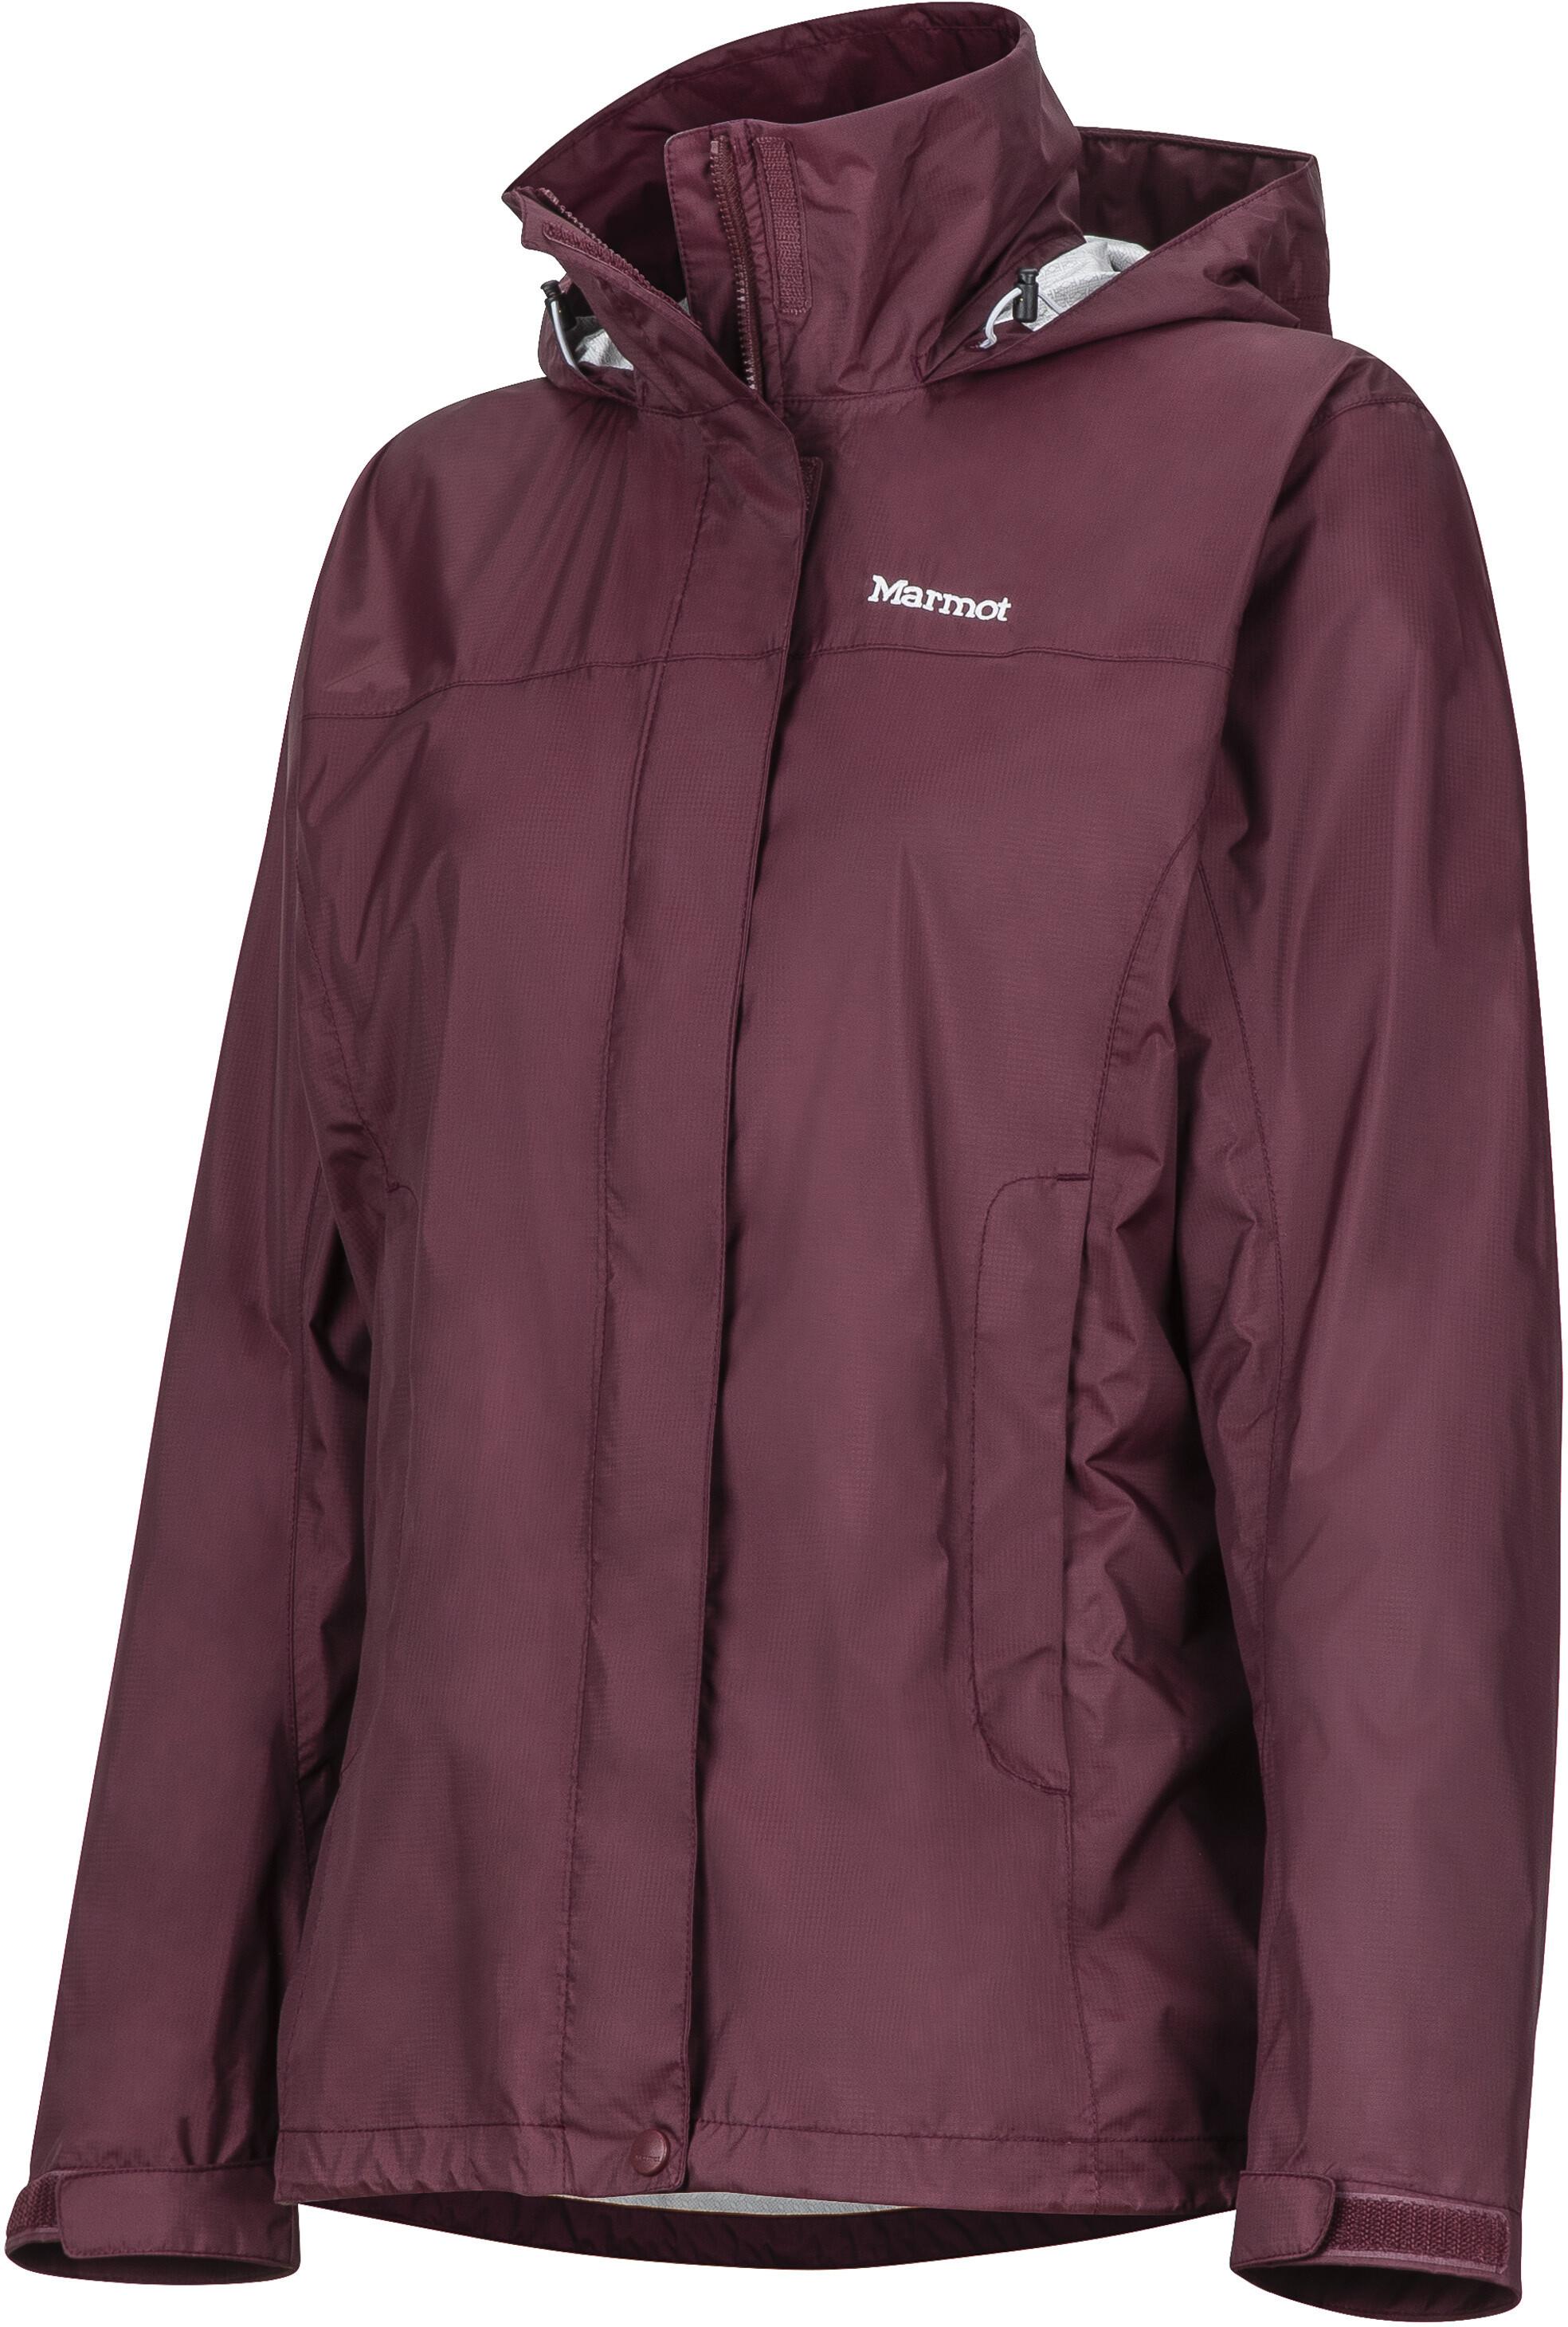 Marmot Women S Alexie Jacket: Marmot PreCip Jacket Women Burgundy